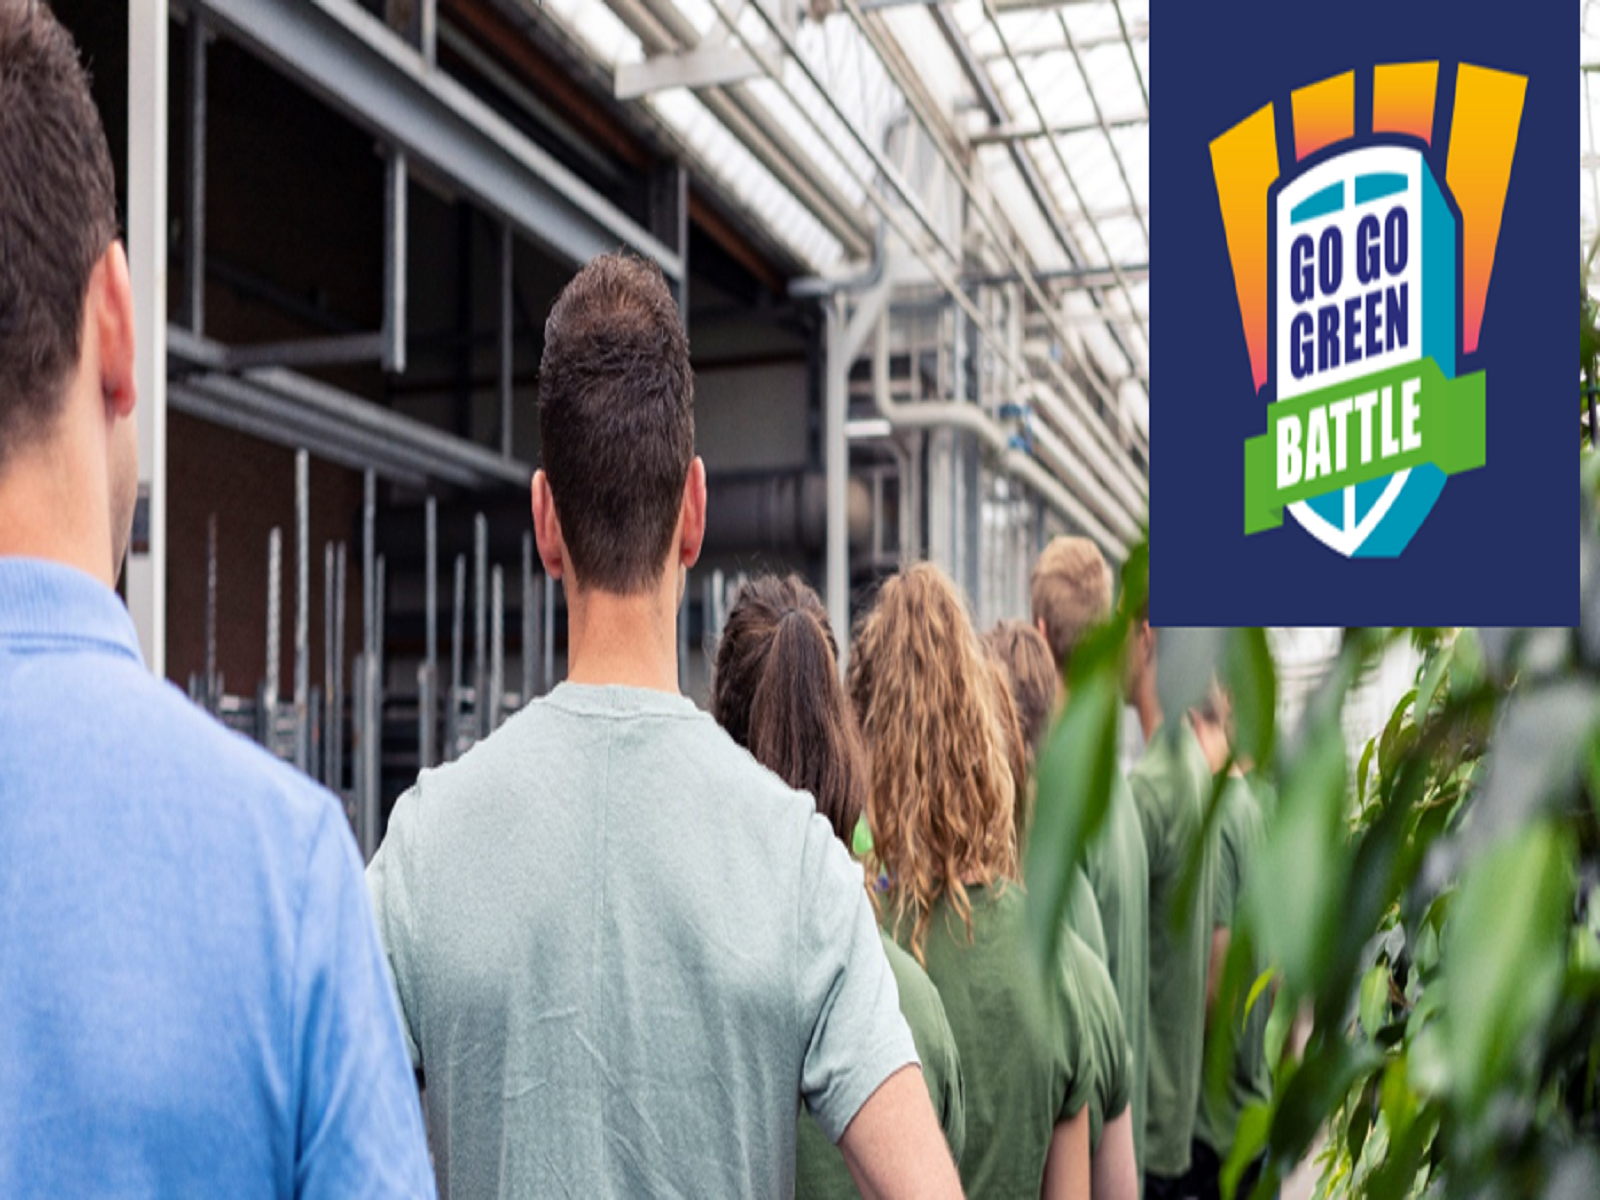 go-go-green-battle-glastuinbouw-greenport